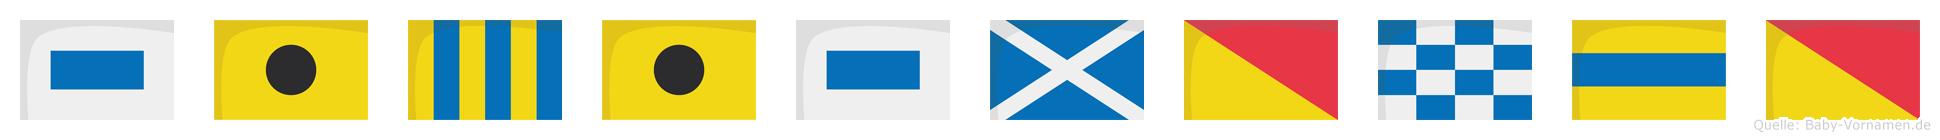 Sigismondo im Flaggenalphabet